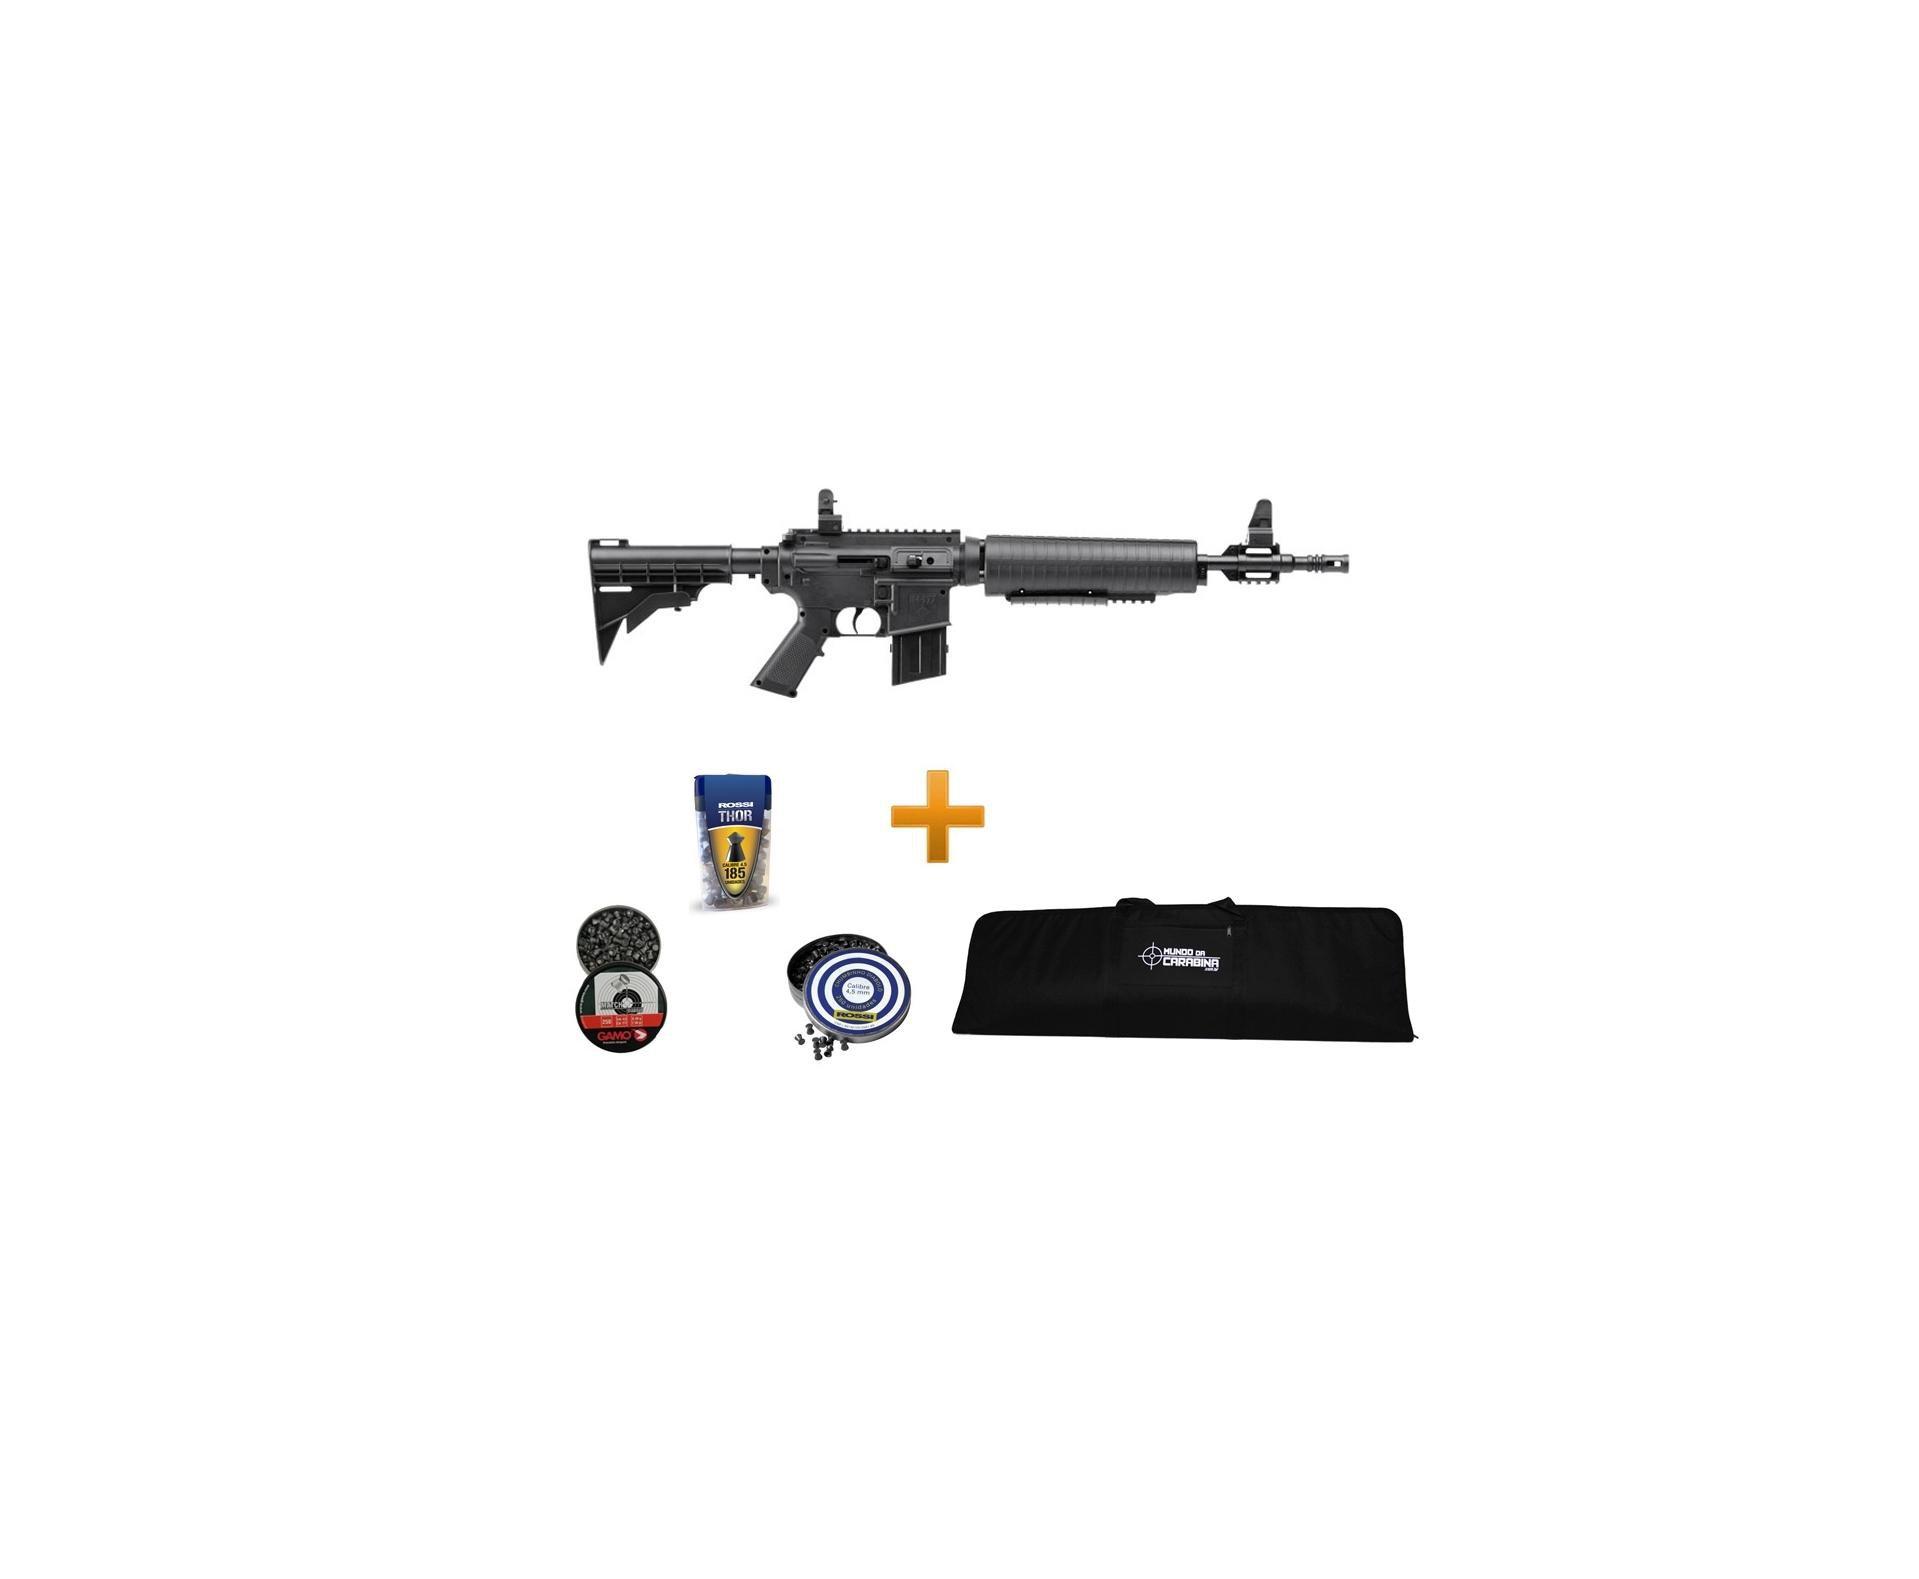 Carabina De Ar Crosman M4-177 Multi Pump - Cal 4,5 Mm + Capa Especial + Chumbinhos